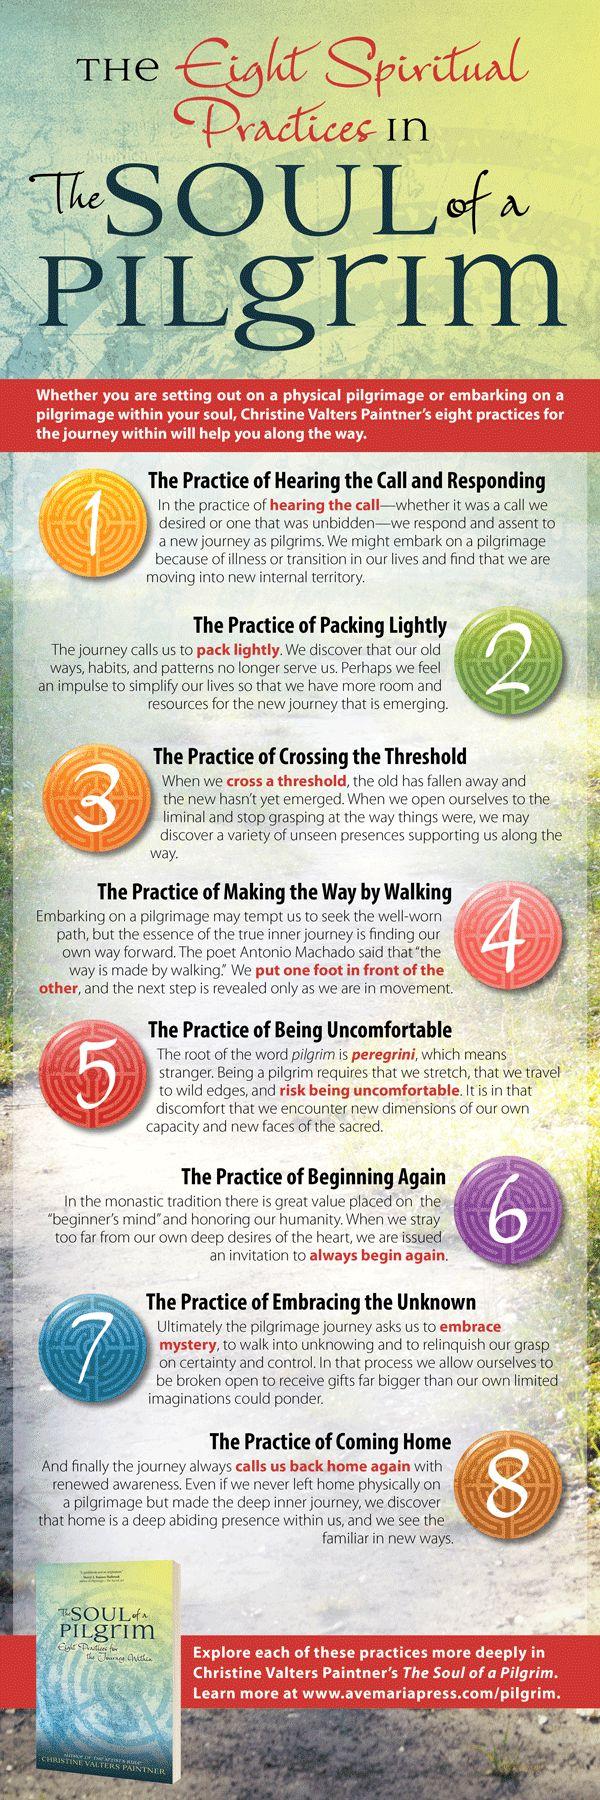 Eight Spiritual Practices